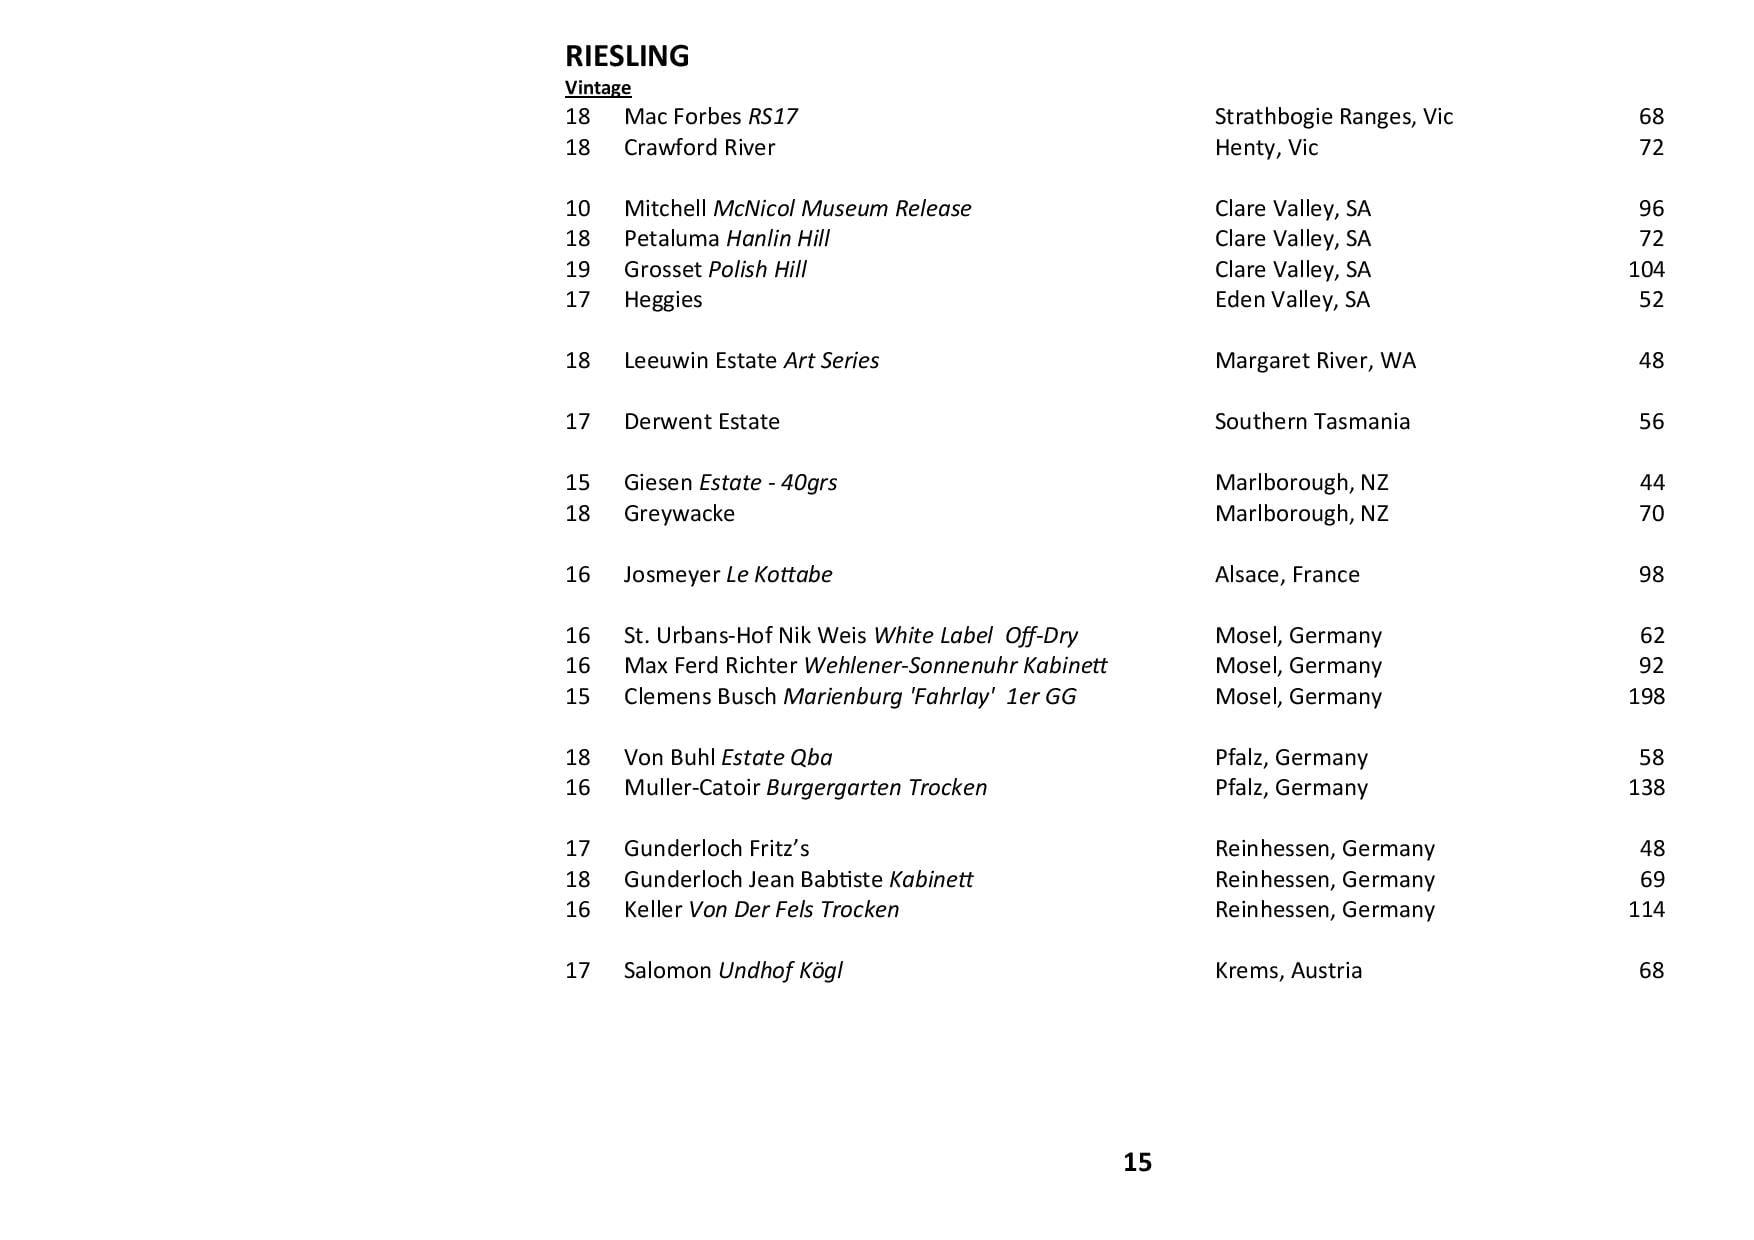 Sails Wine List 2020 Page 015